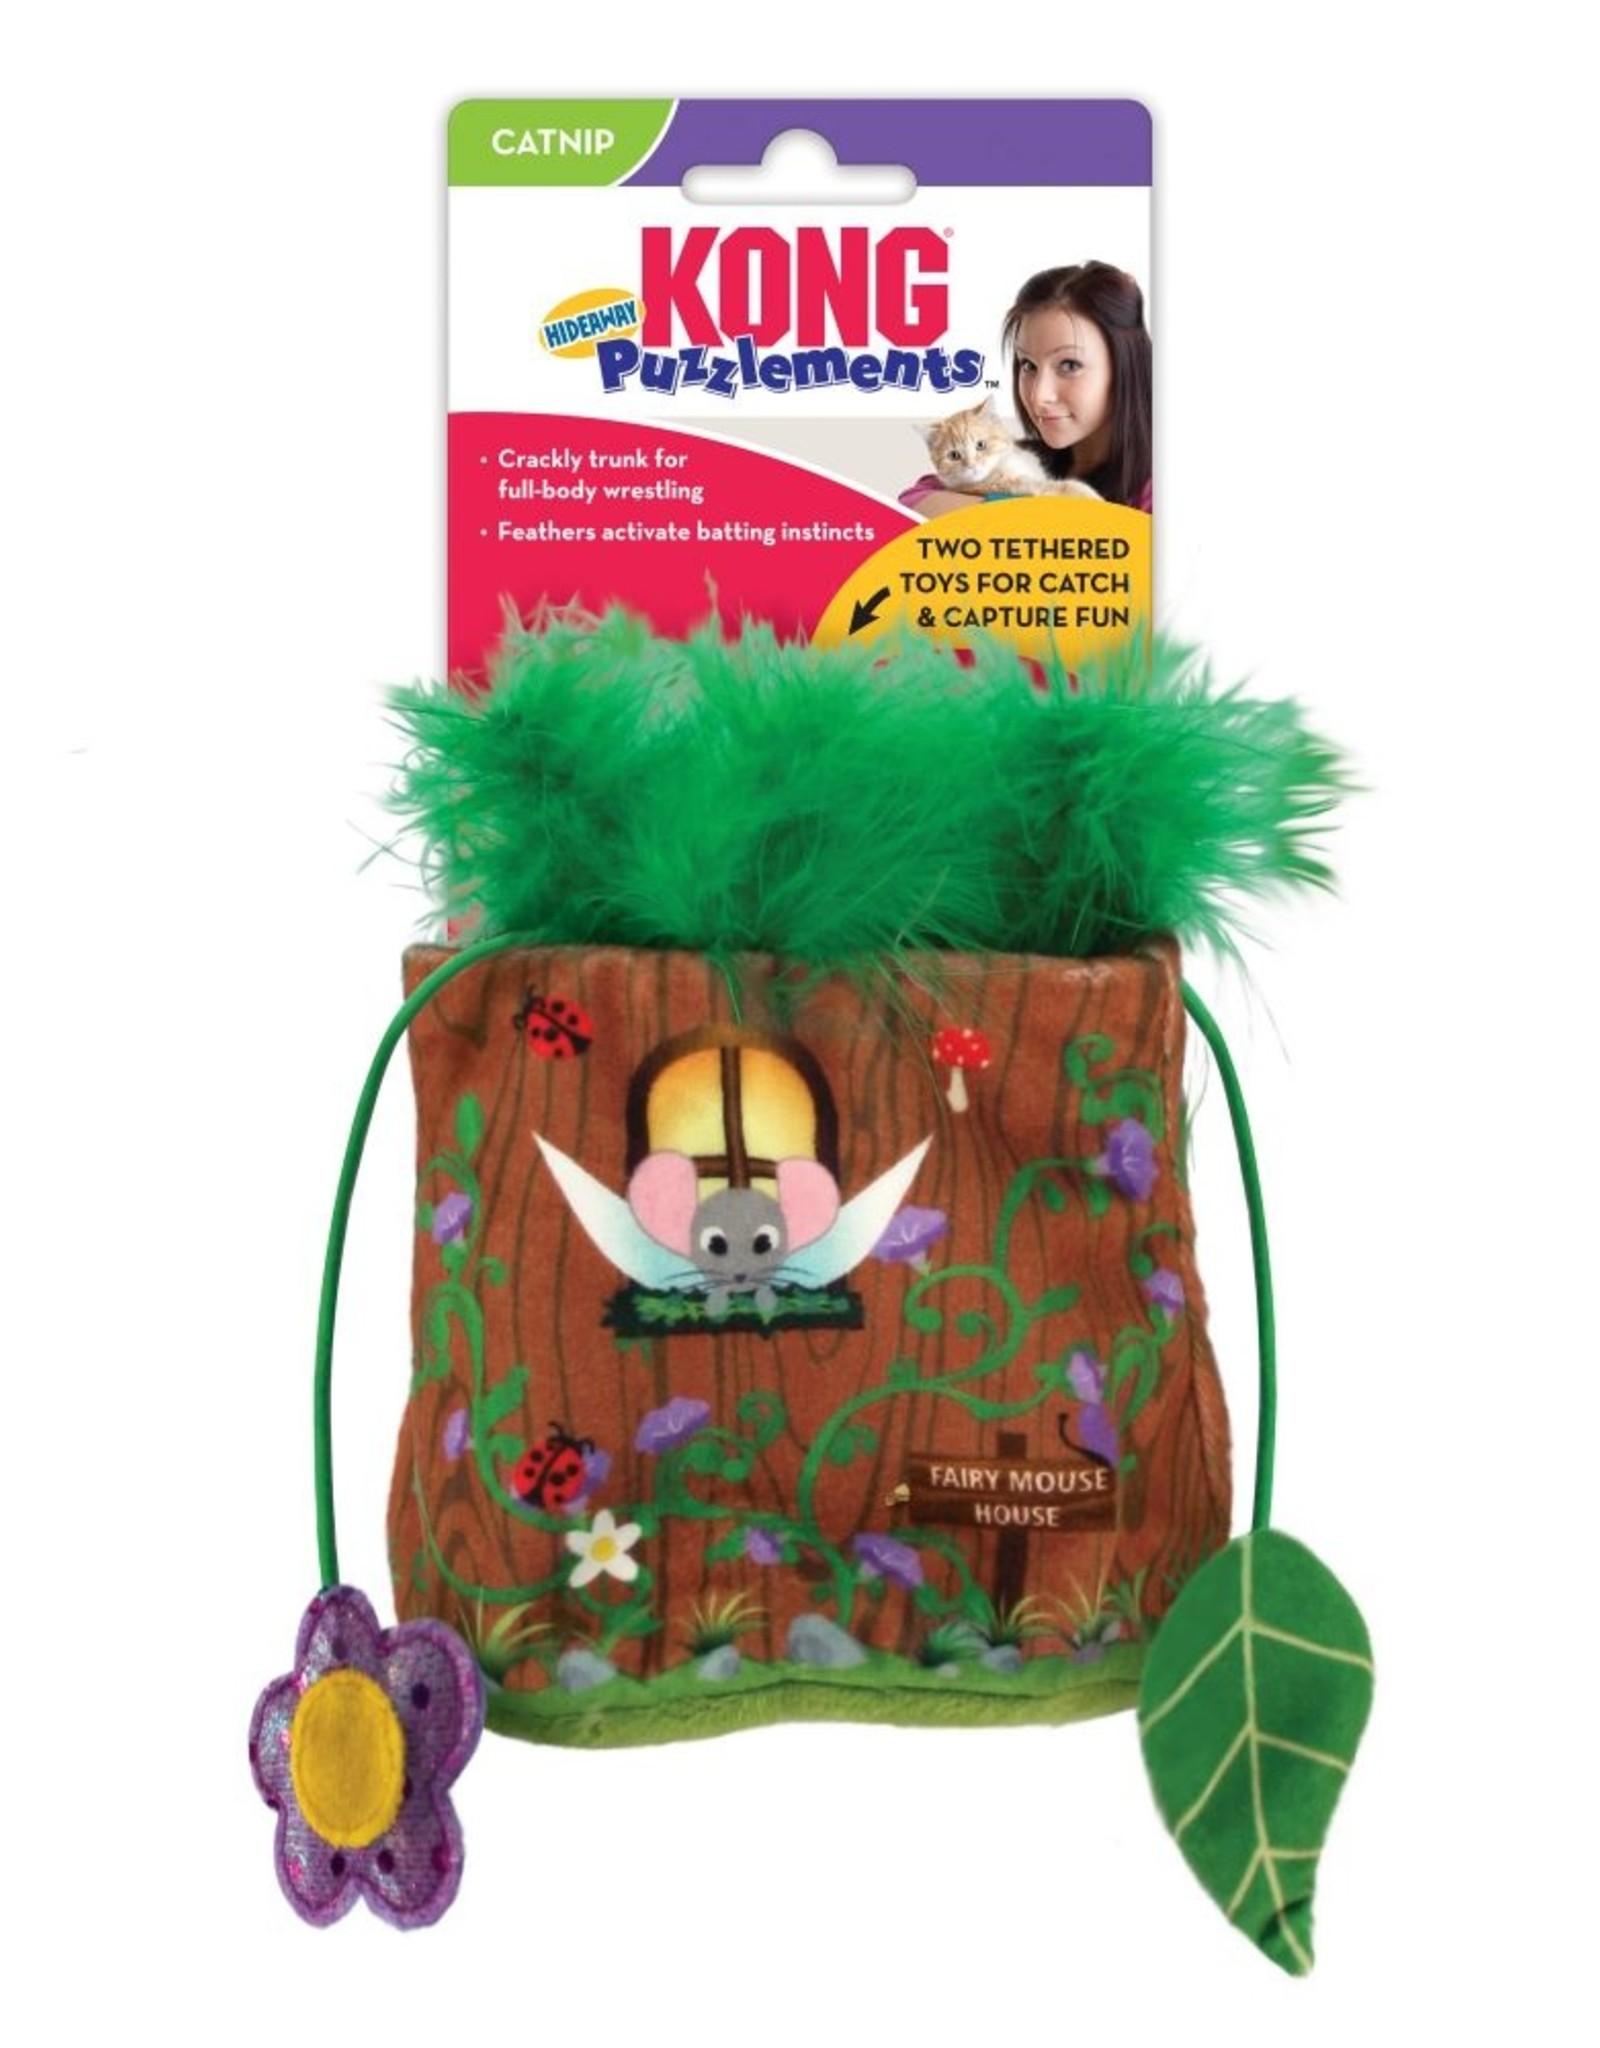 Kong Puzzlements Hideaway Cat Toy